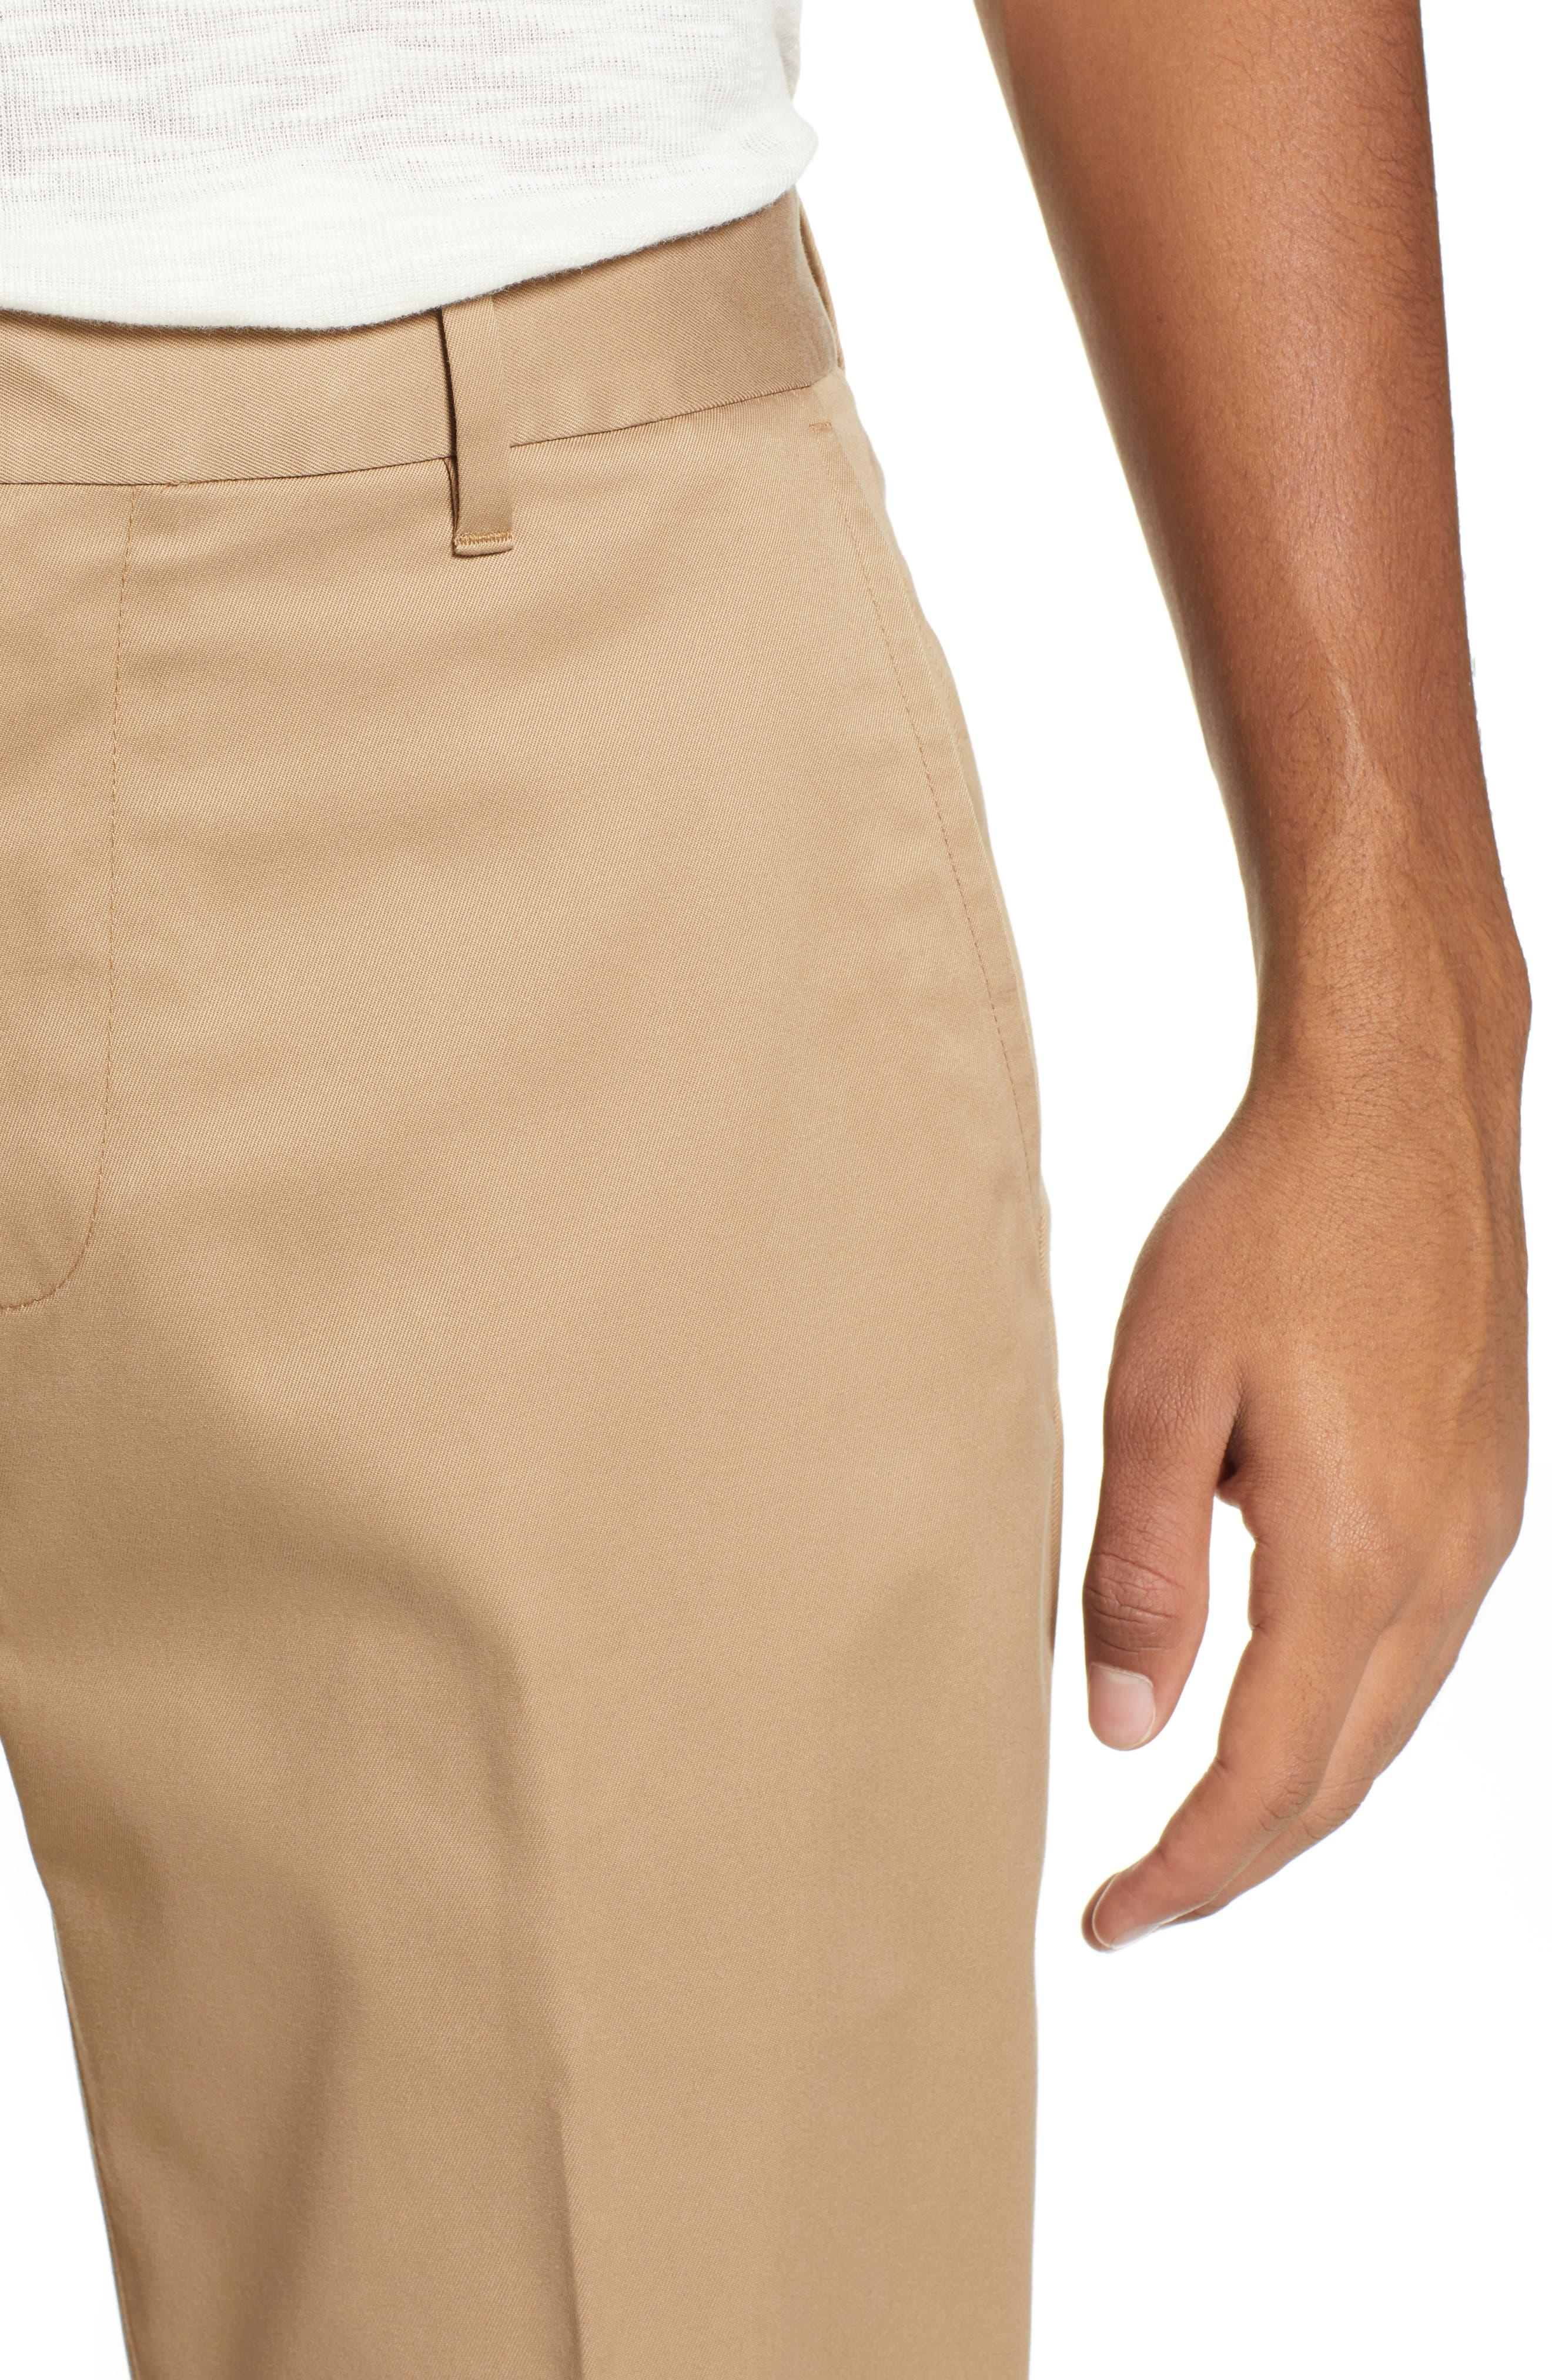 BONOBOS,                             Weekday Warrior Straight Leg Stretch Dress Pants,                             Alternate thumbnail 4, color,                             KHAKI TAN